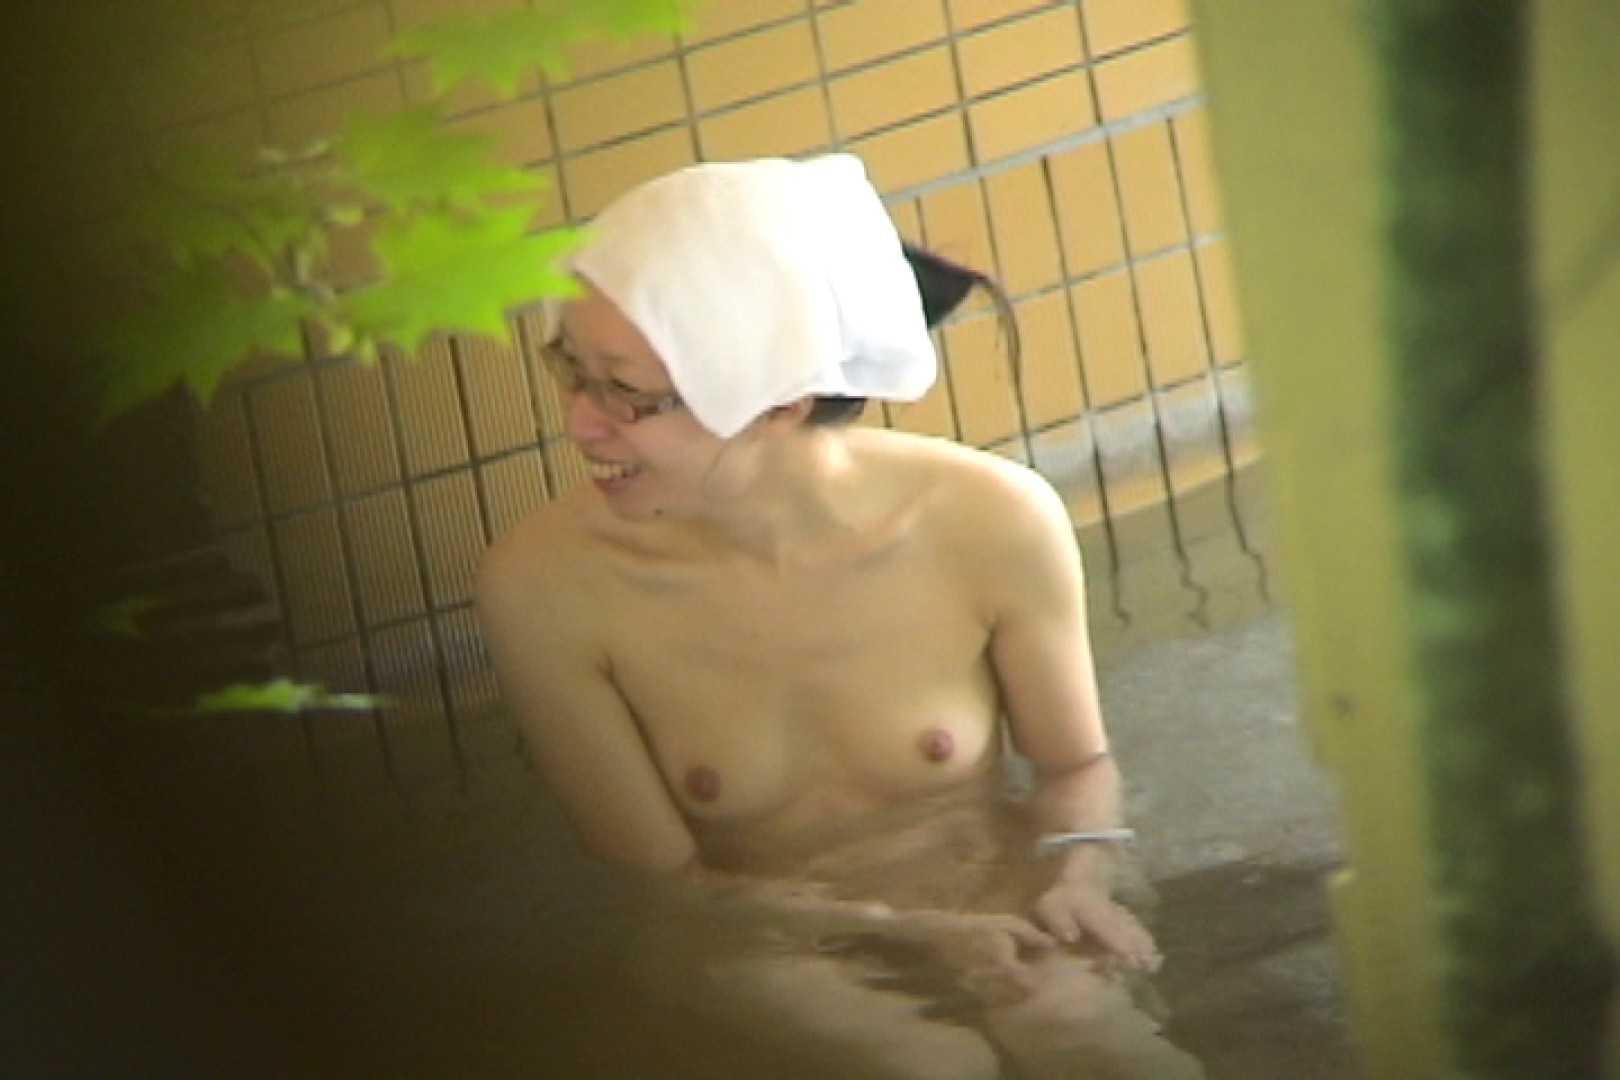 Aquaな露天風呂Vol.703 盗撮シリーズ   露天風呂編  95PIX 49